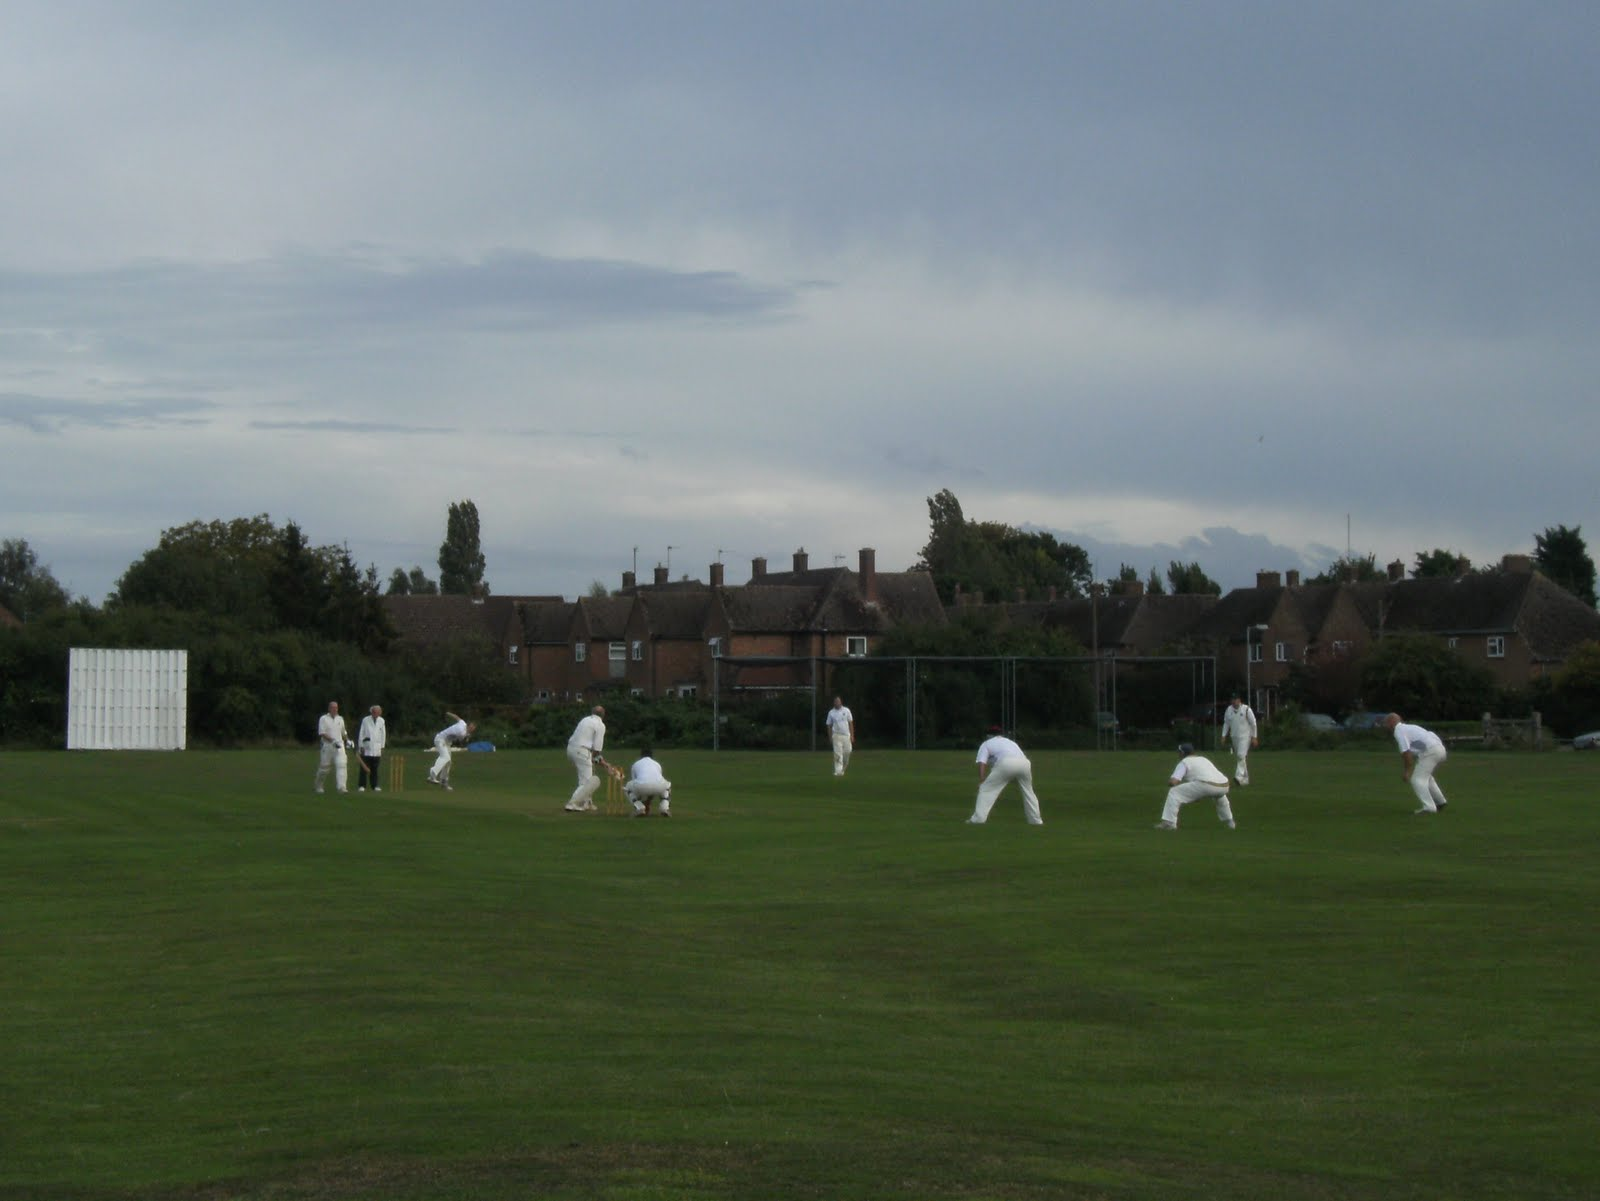 DSCF9486 An undulating cricket pitch at Godmanchester